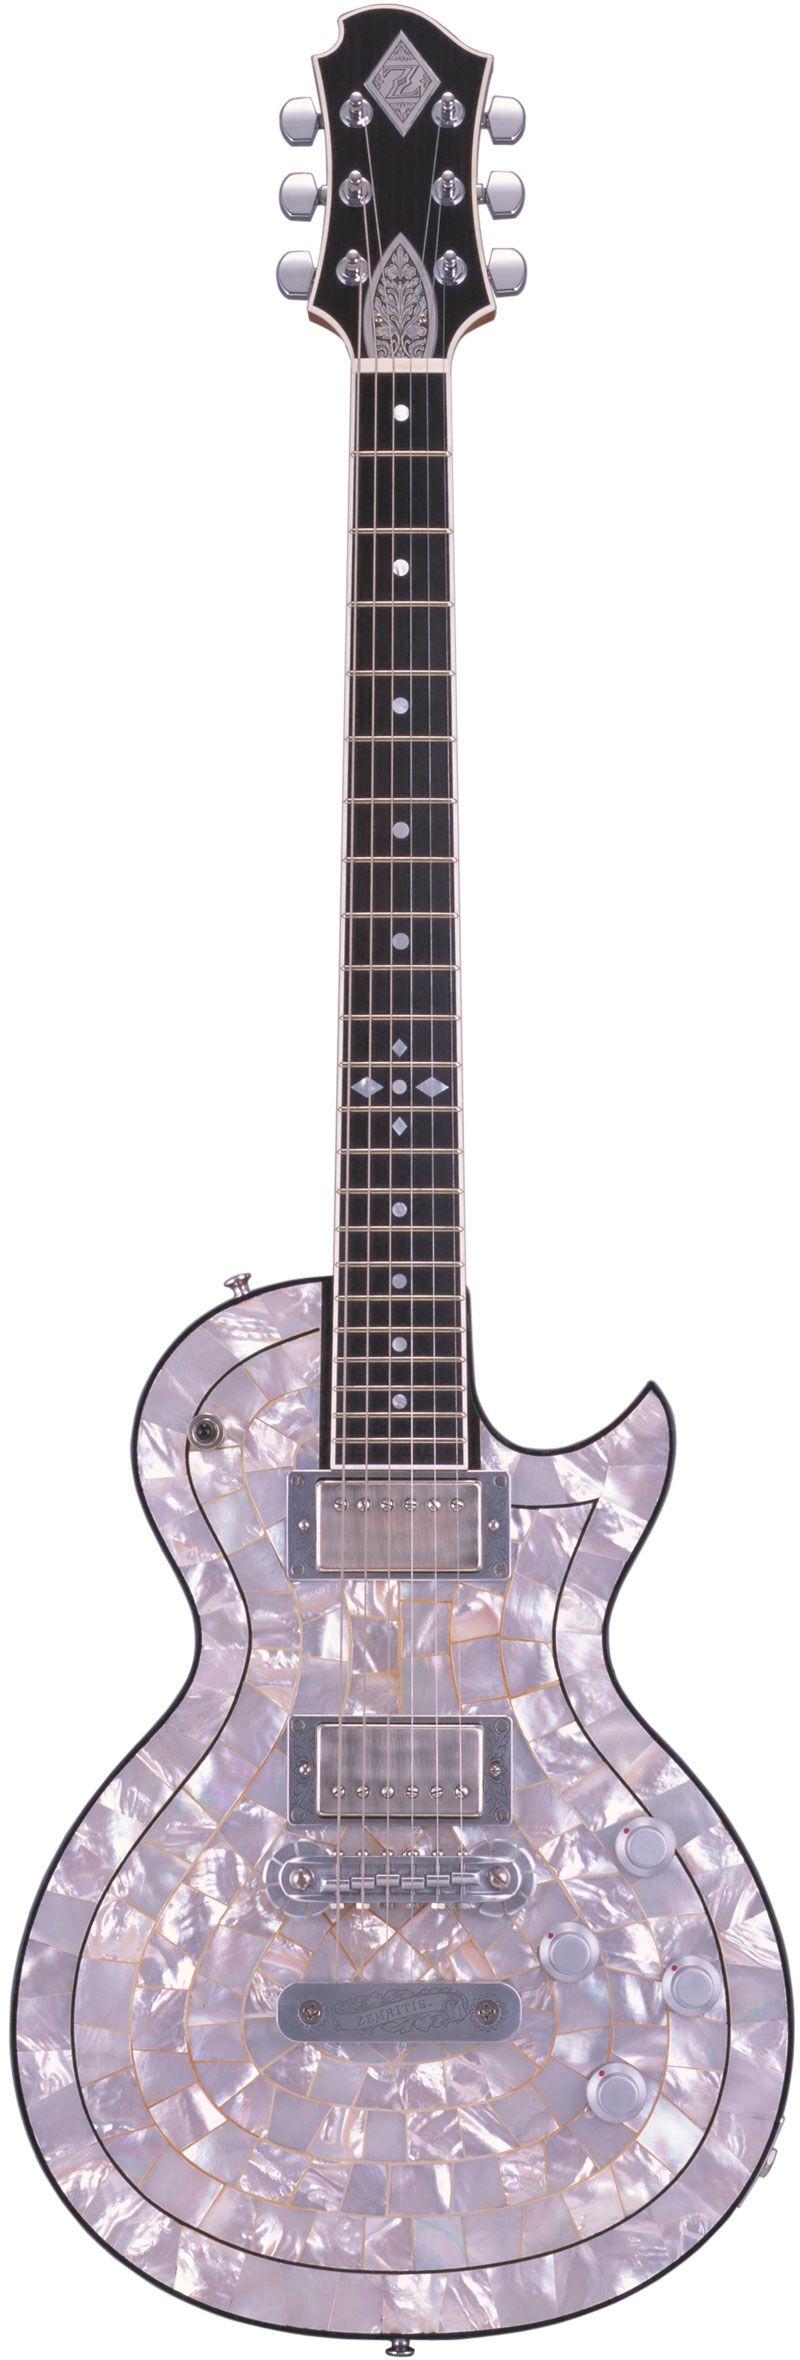 ZEMAITIS PF200-EDGE Pearl Front™ Guitar